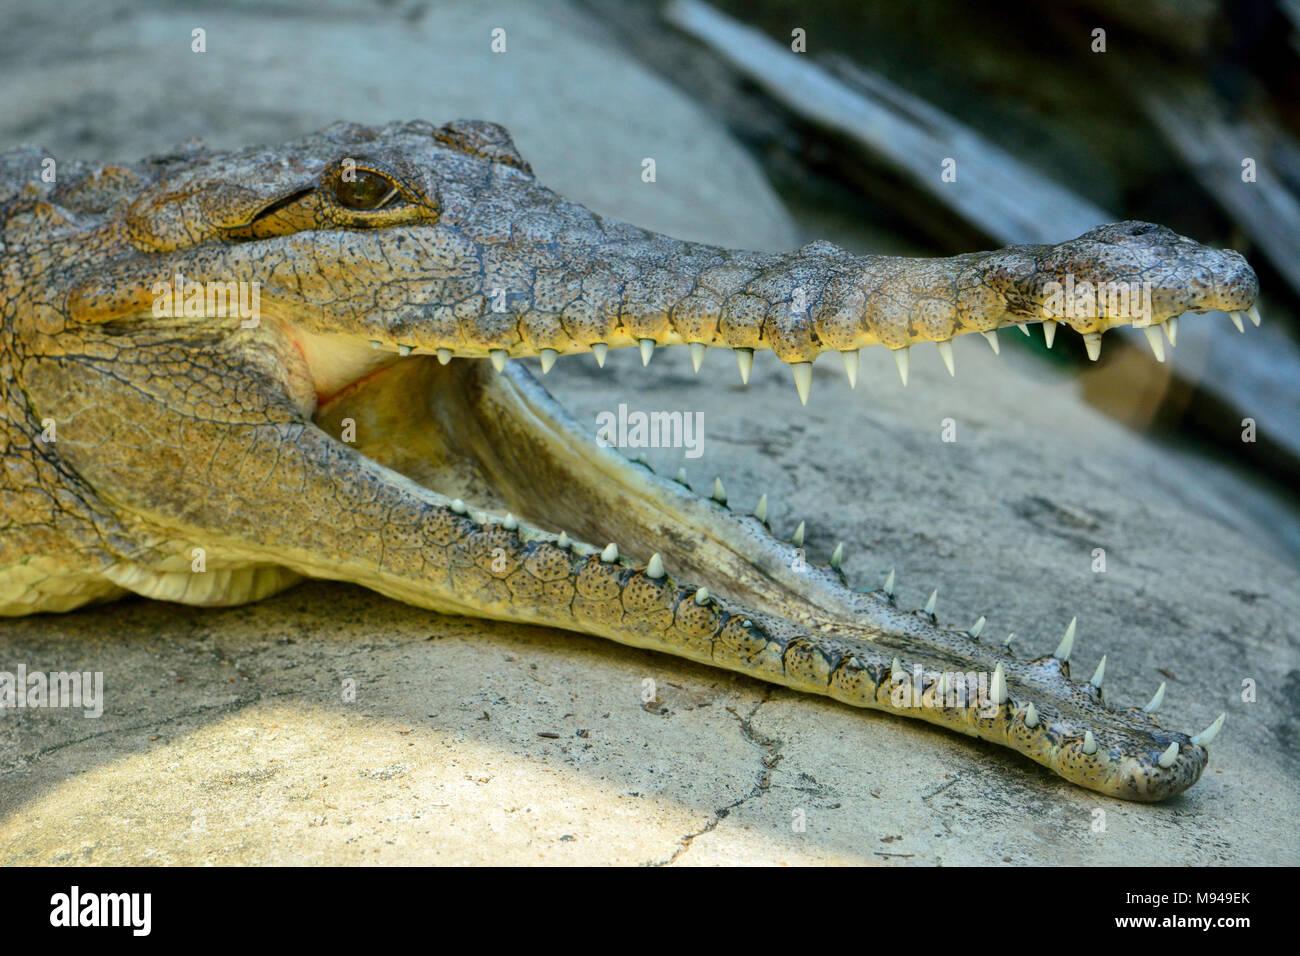 Head of freshwater crocodile (Crocodylus johnsoni) with open mouth. - Stock Image